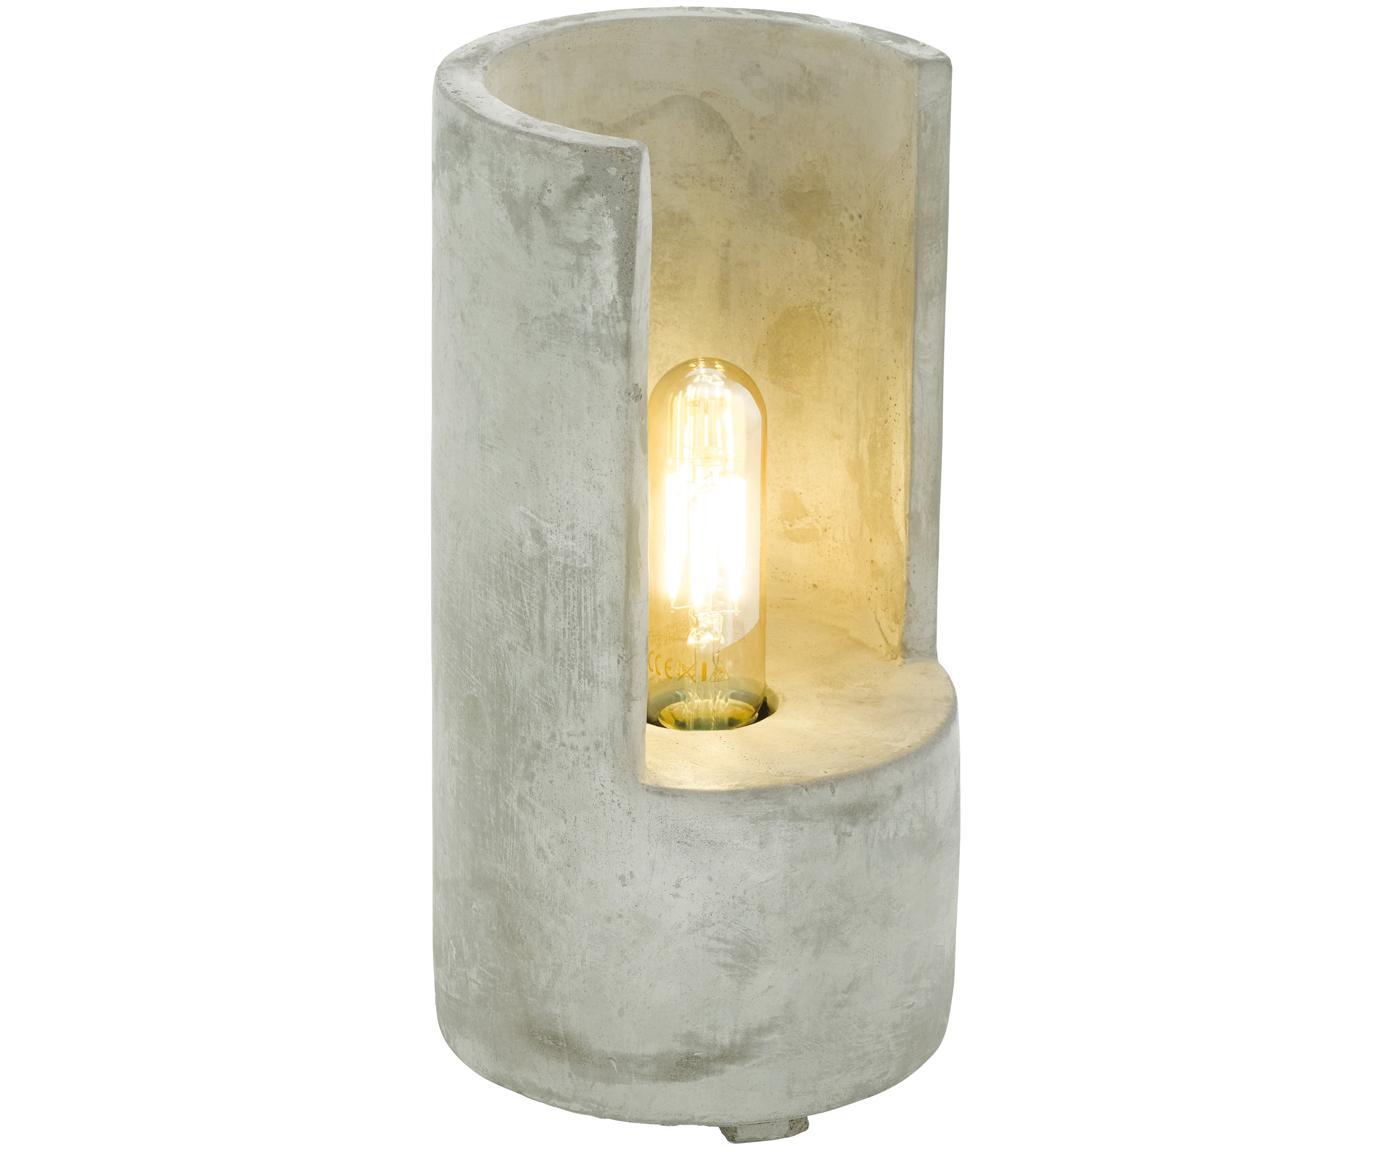 Betonnen tafellamp Lynton, Lamp: betonkleurig, Betongrijs, Ø 14 x H 27 cm